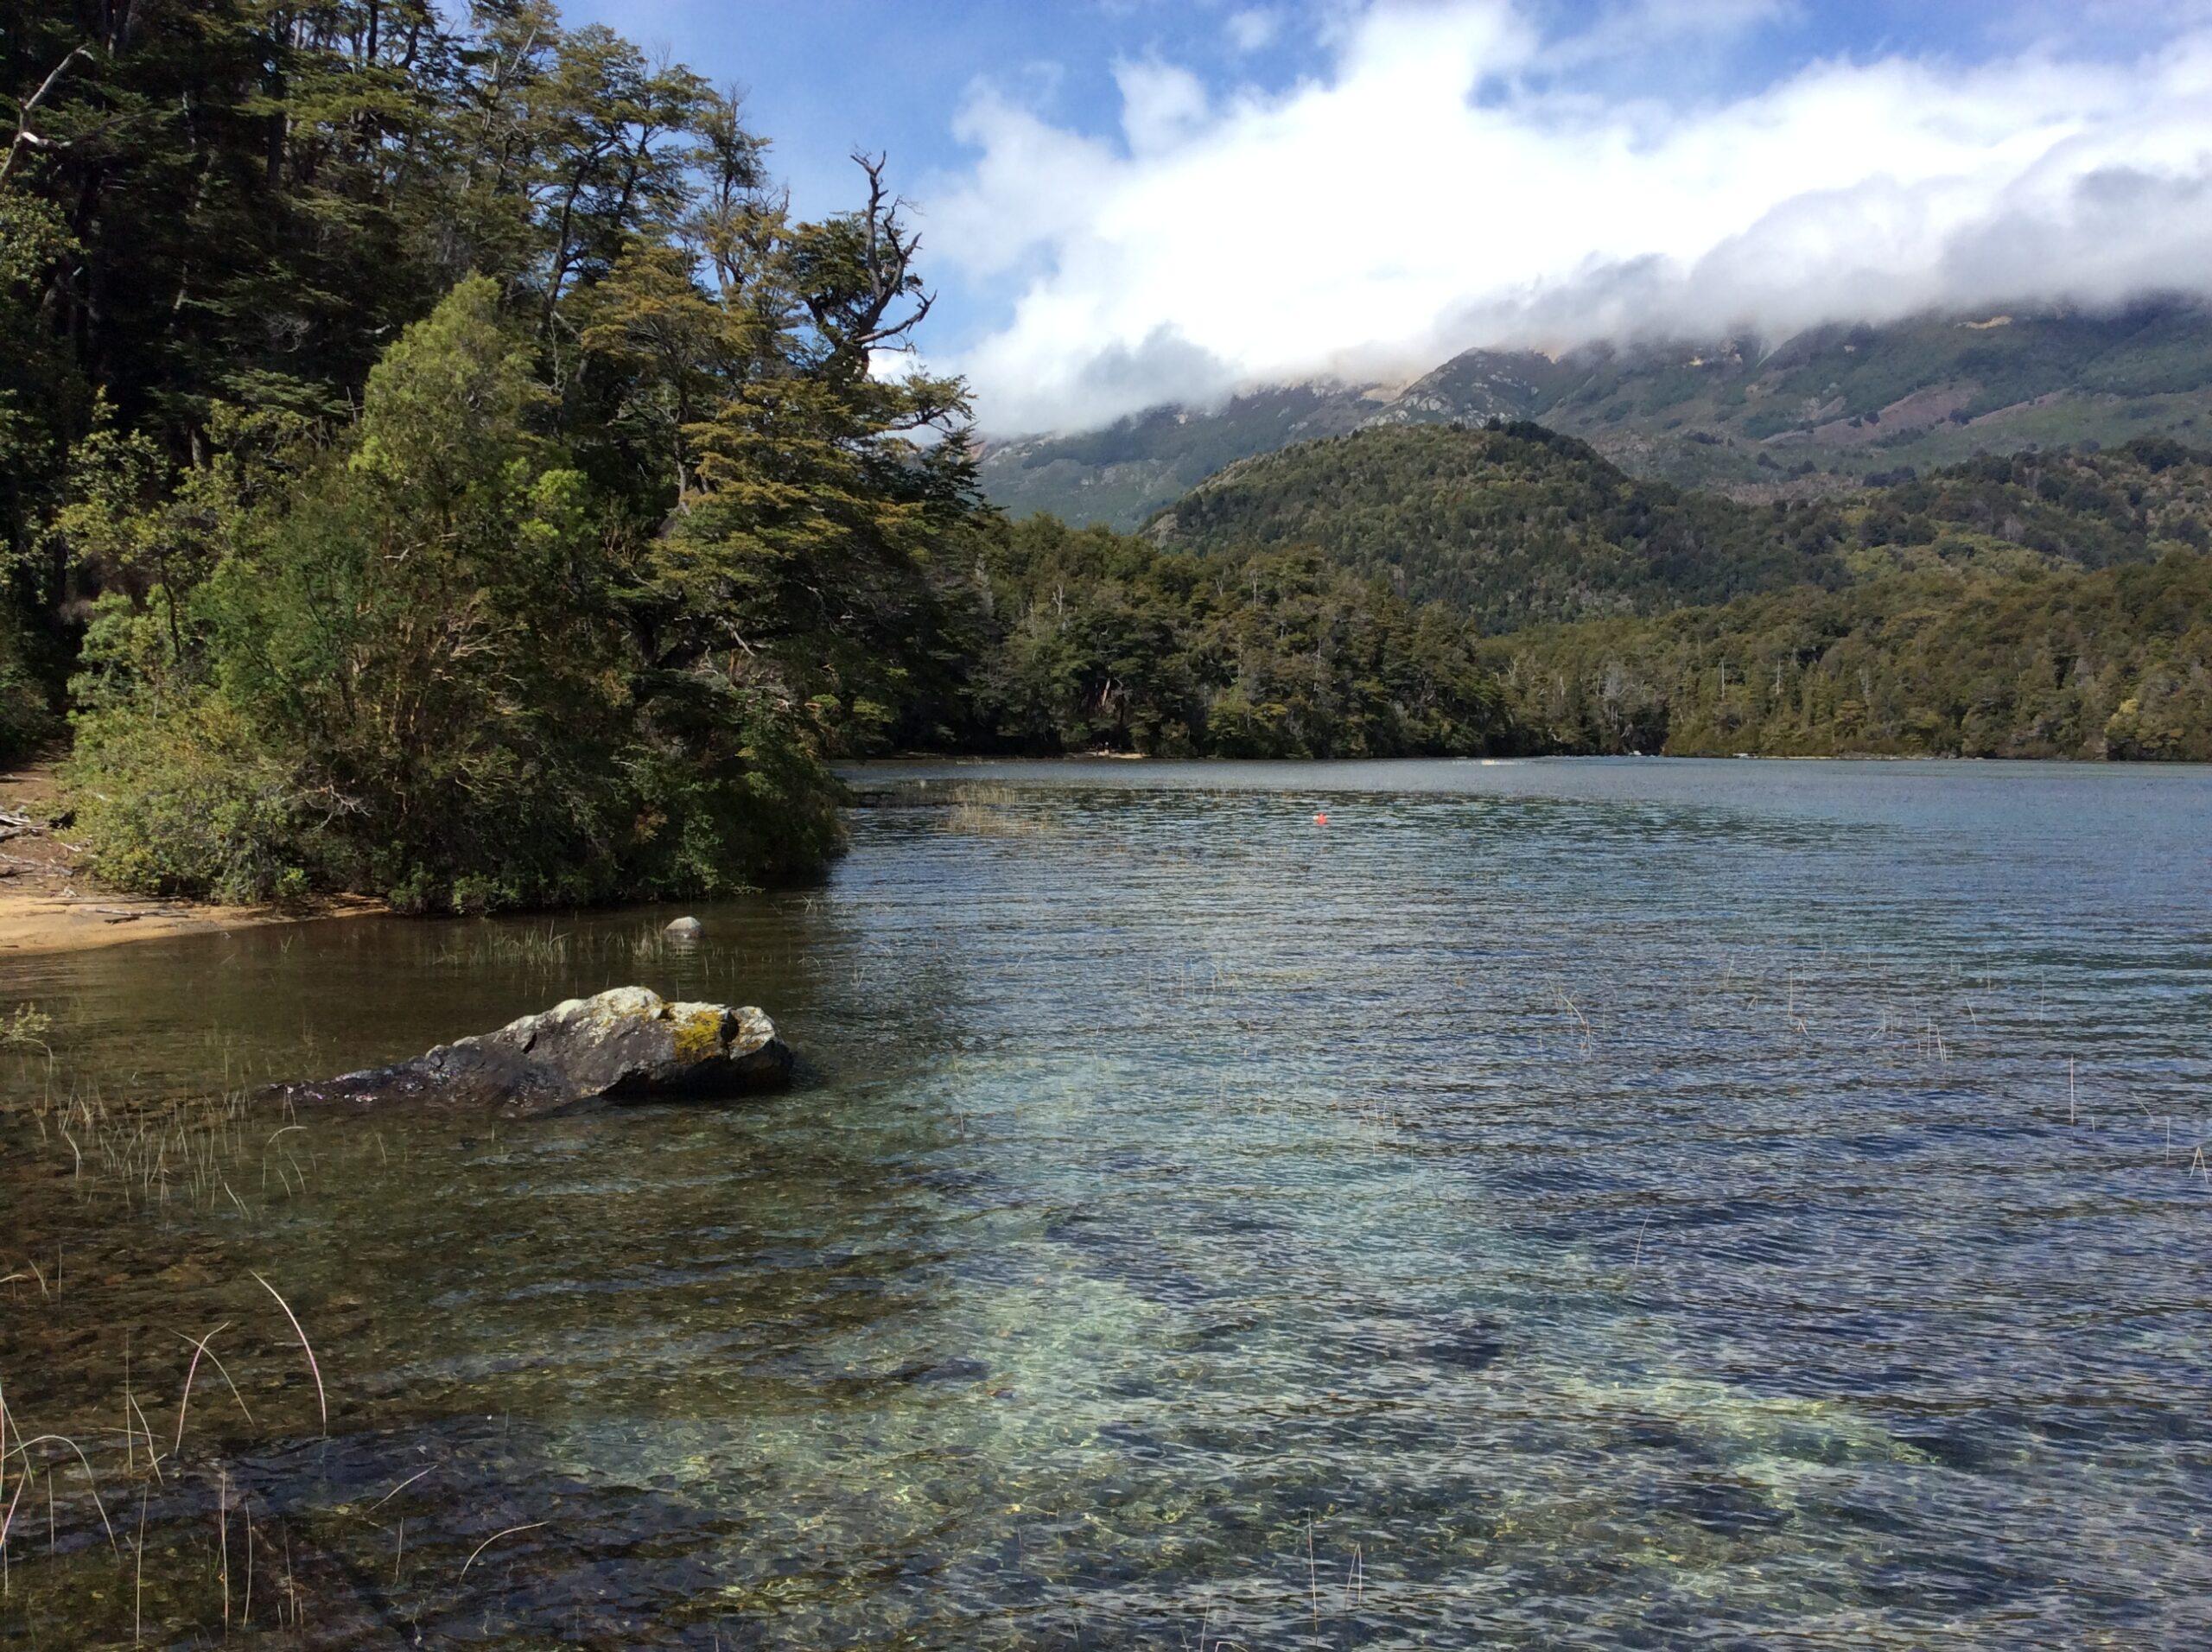 Lago Menendez in Alerces National Park